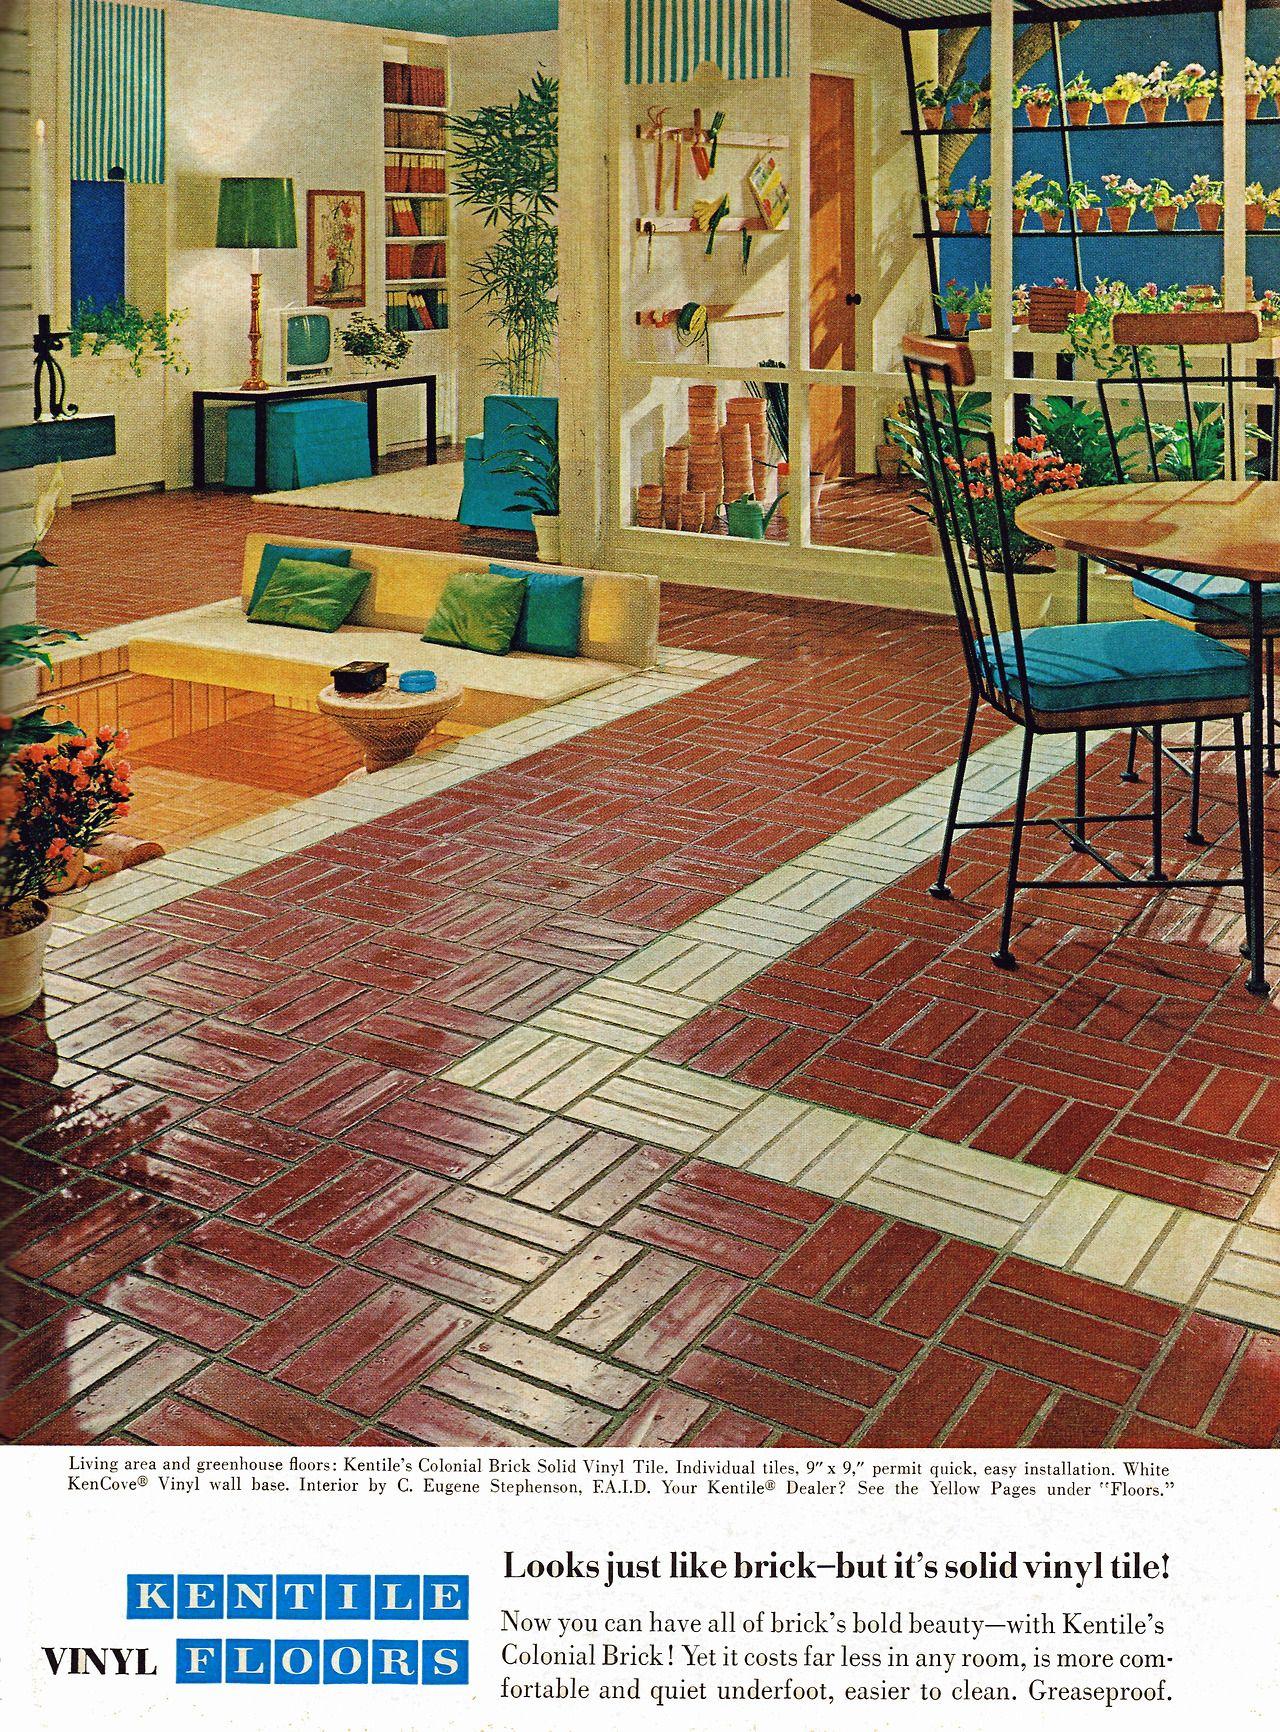 1967 Kentile Vinyl Floors I Love The Color Palette But I Remember The Floor Mid Century Modern Design Mid Century Modern Interiors Mid Century Modern House